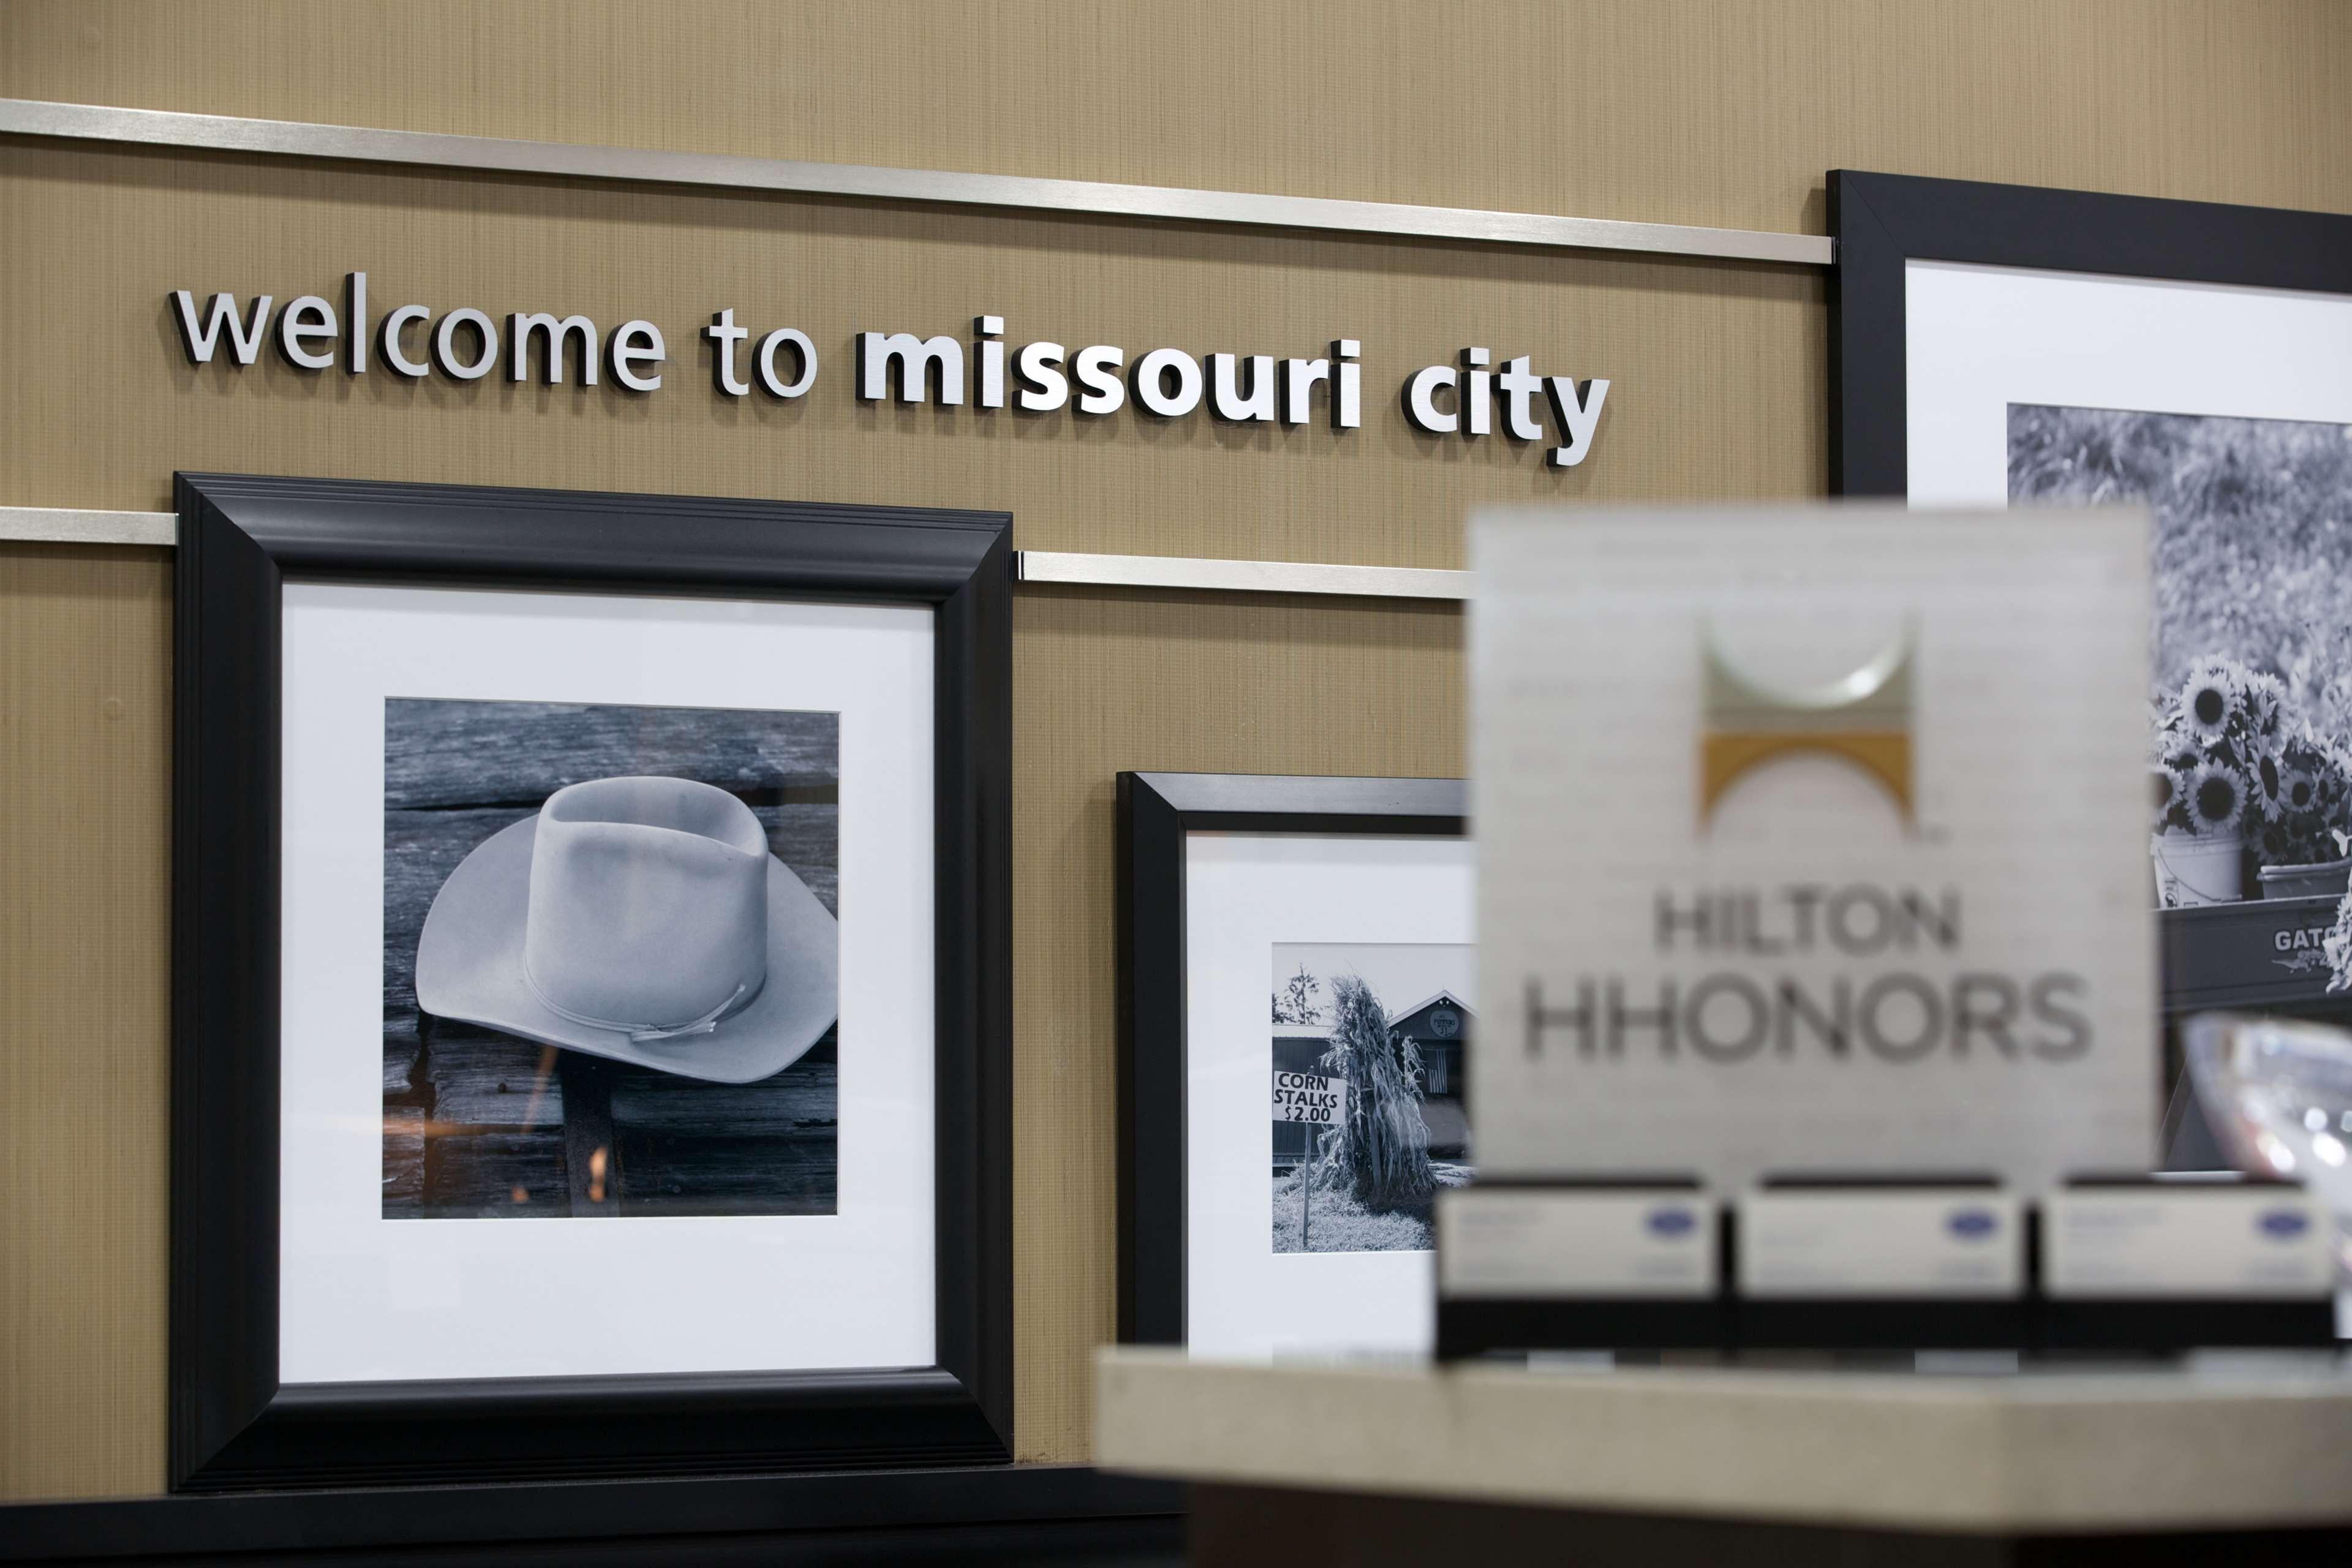 Hampton Inn & Suites Missouri City, TX image 6